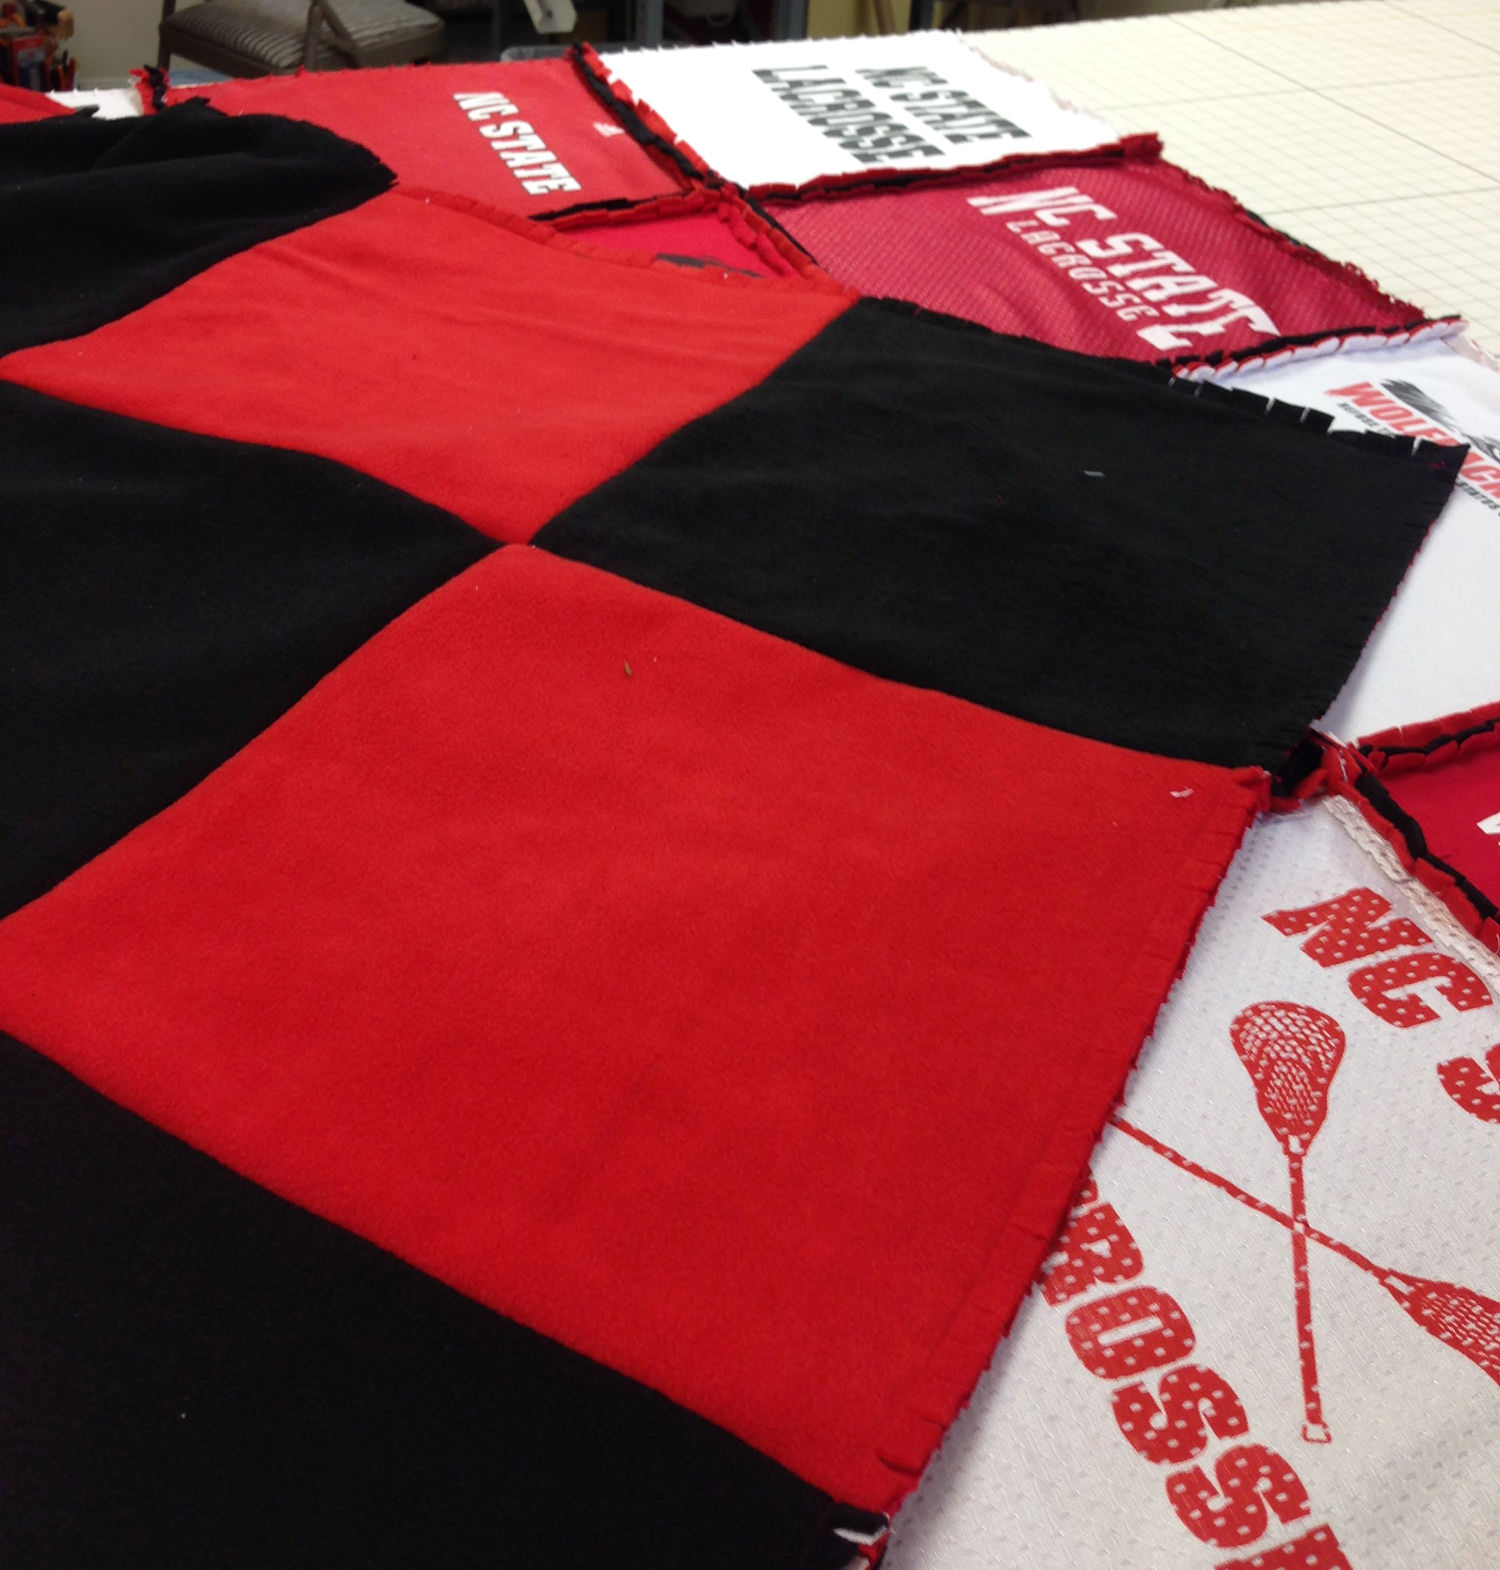 custom-t-shirt-quilts-DBH-designs-willow-street-pennsylvania-3.JPG